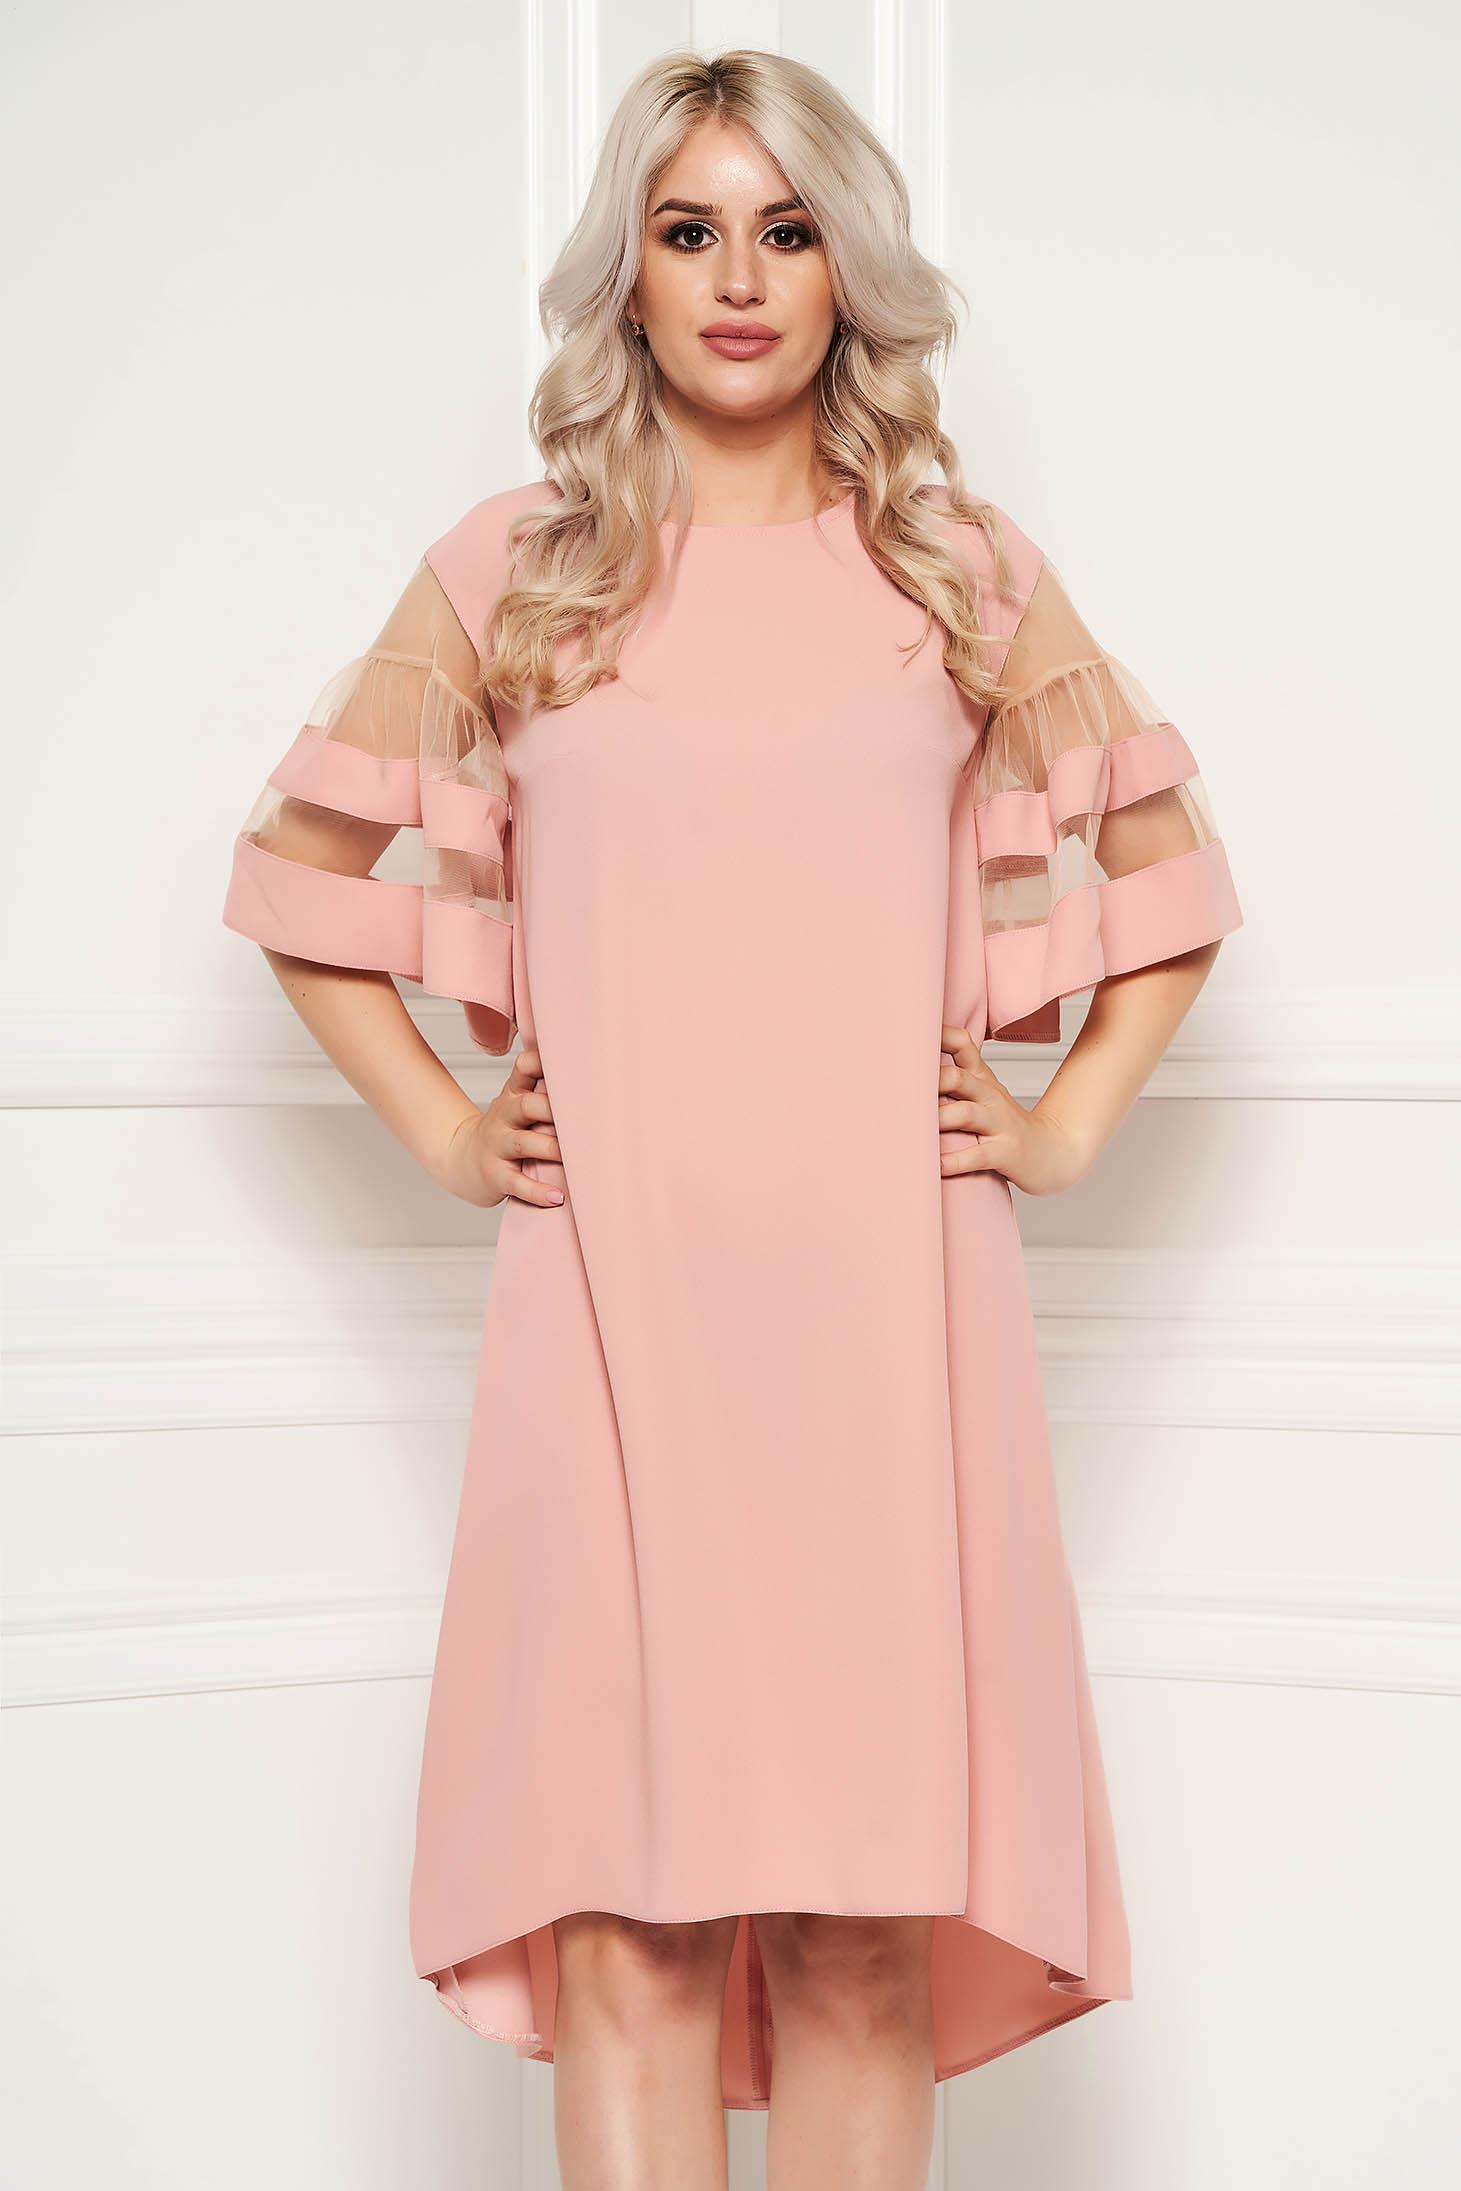 Rochie roz prafuit eleganta asimetrica cu croi larg din material subtire cu maneci scurte